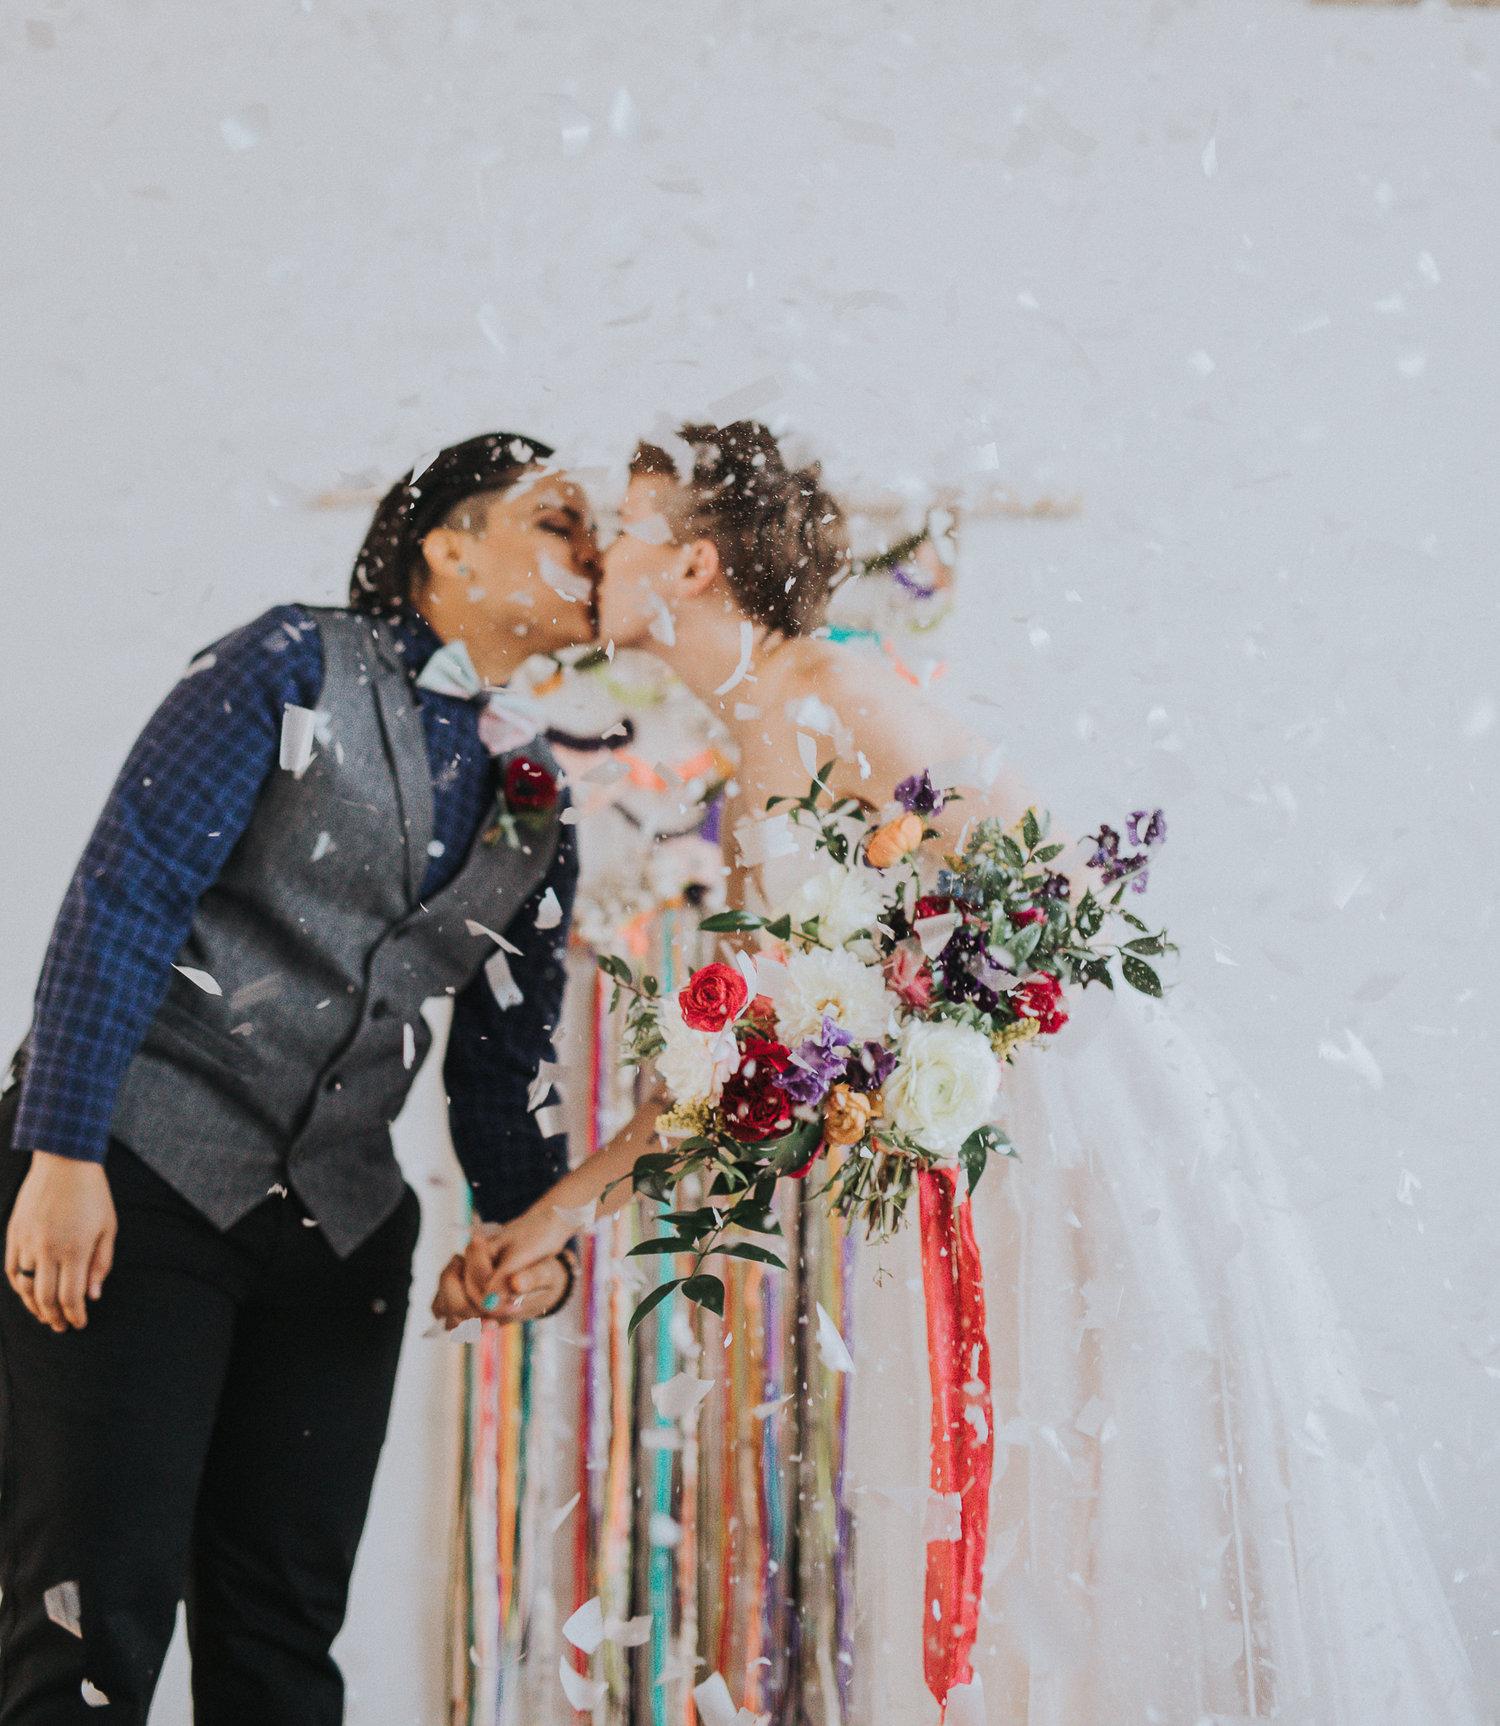 Playful+and+Colorful+LGBTQ+wedding+inspiration+styled+shoot+with+hedgehog,+dog,+and+iguana+in+Columbus+Ohio.jpeg